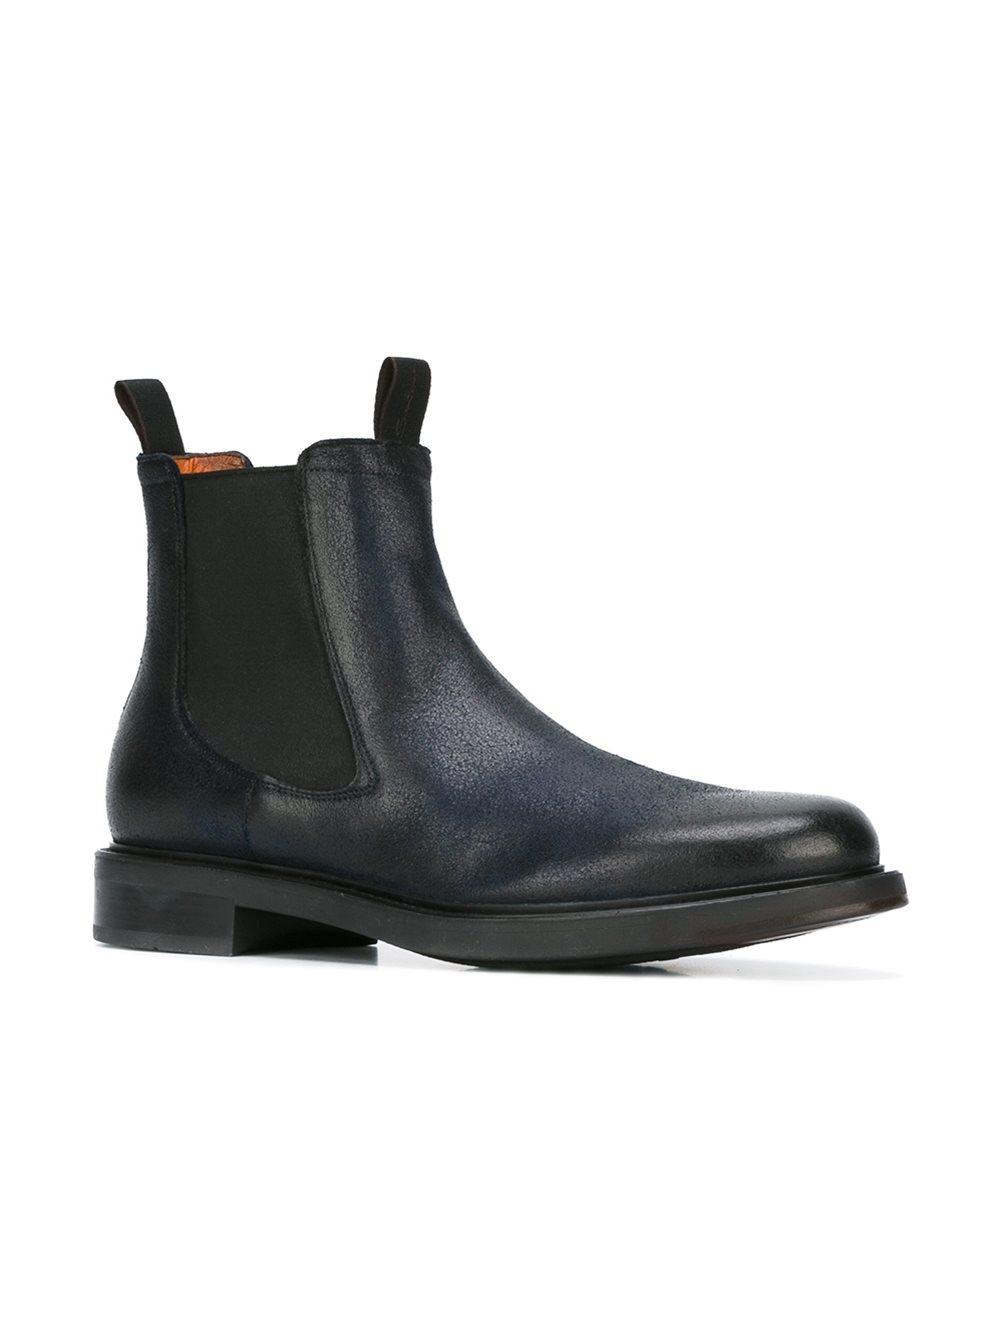 santoni beatls chelsea boots in black for men lyst. Black Bedroom Furniture Sets. Home Design Ideas